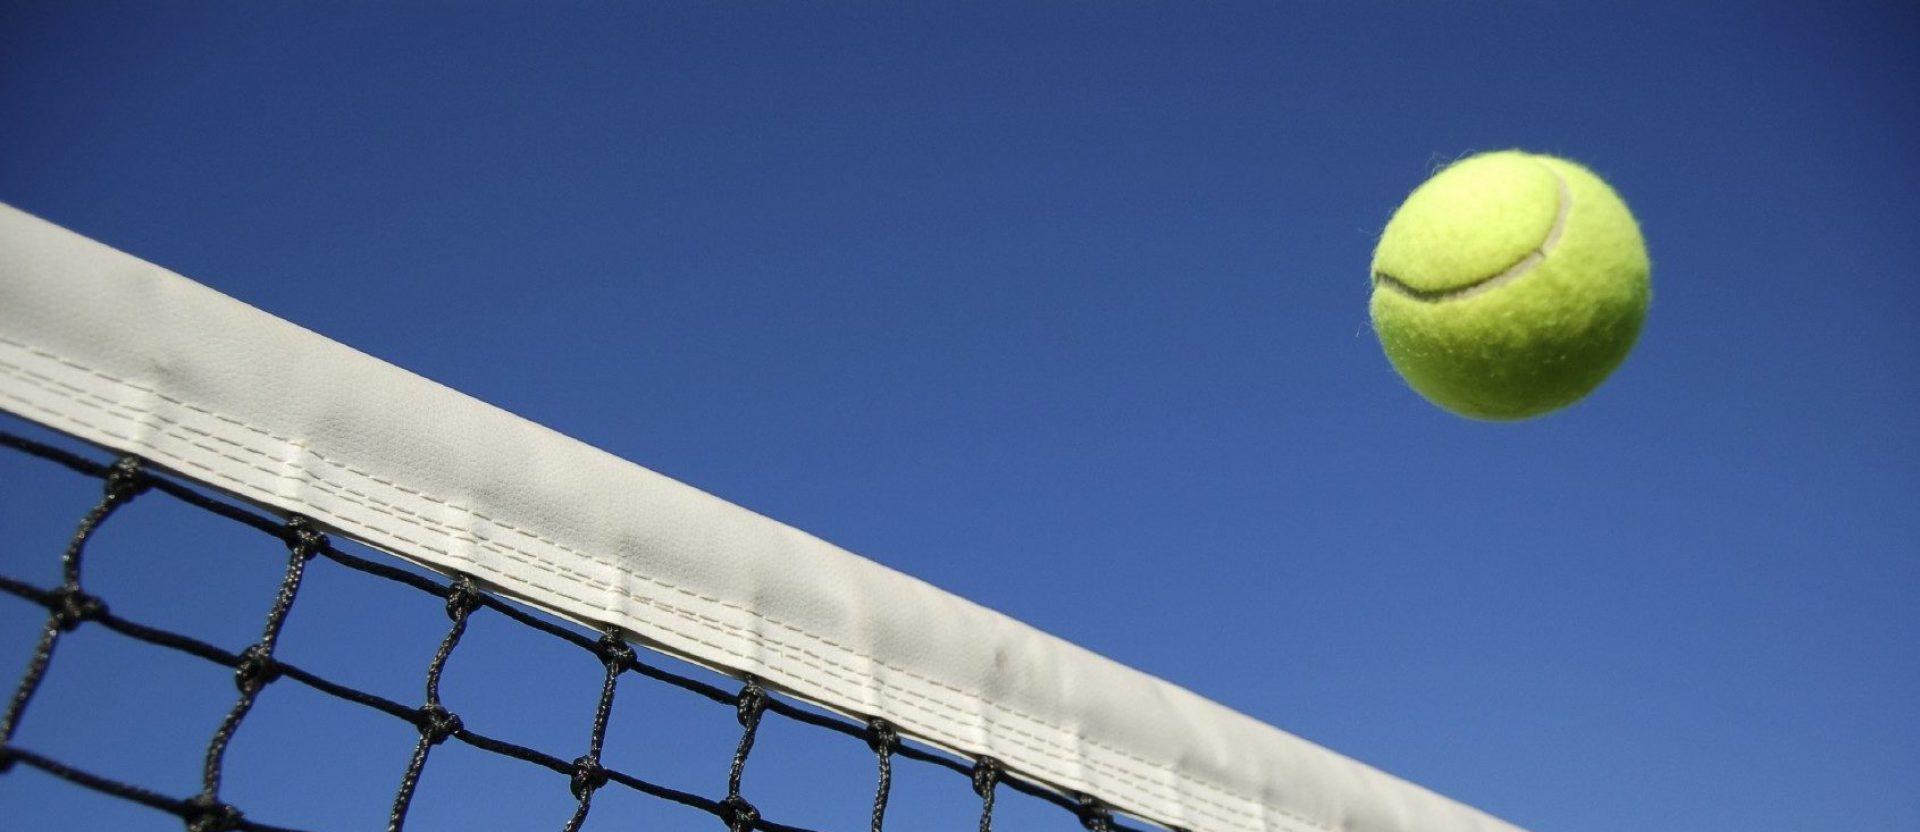 Basildon Tennis